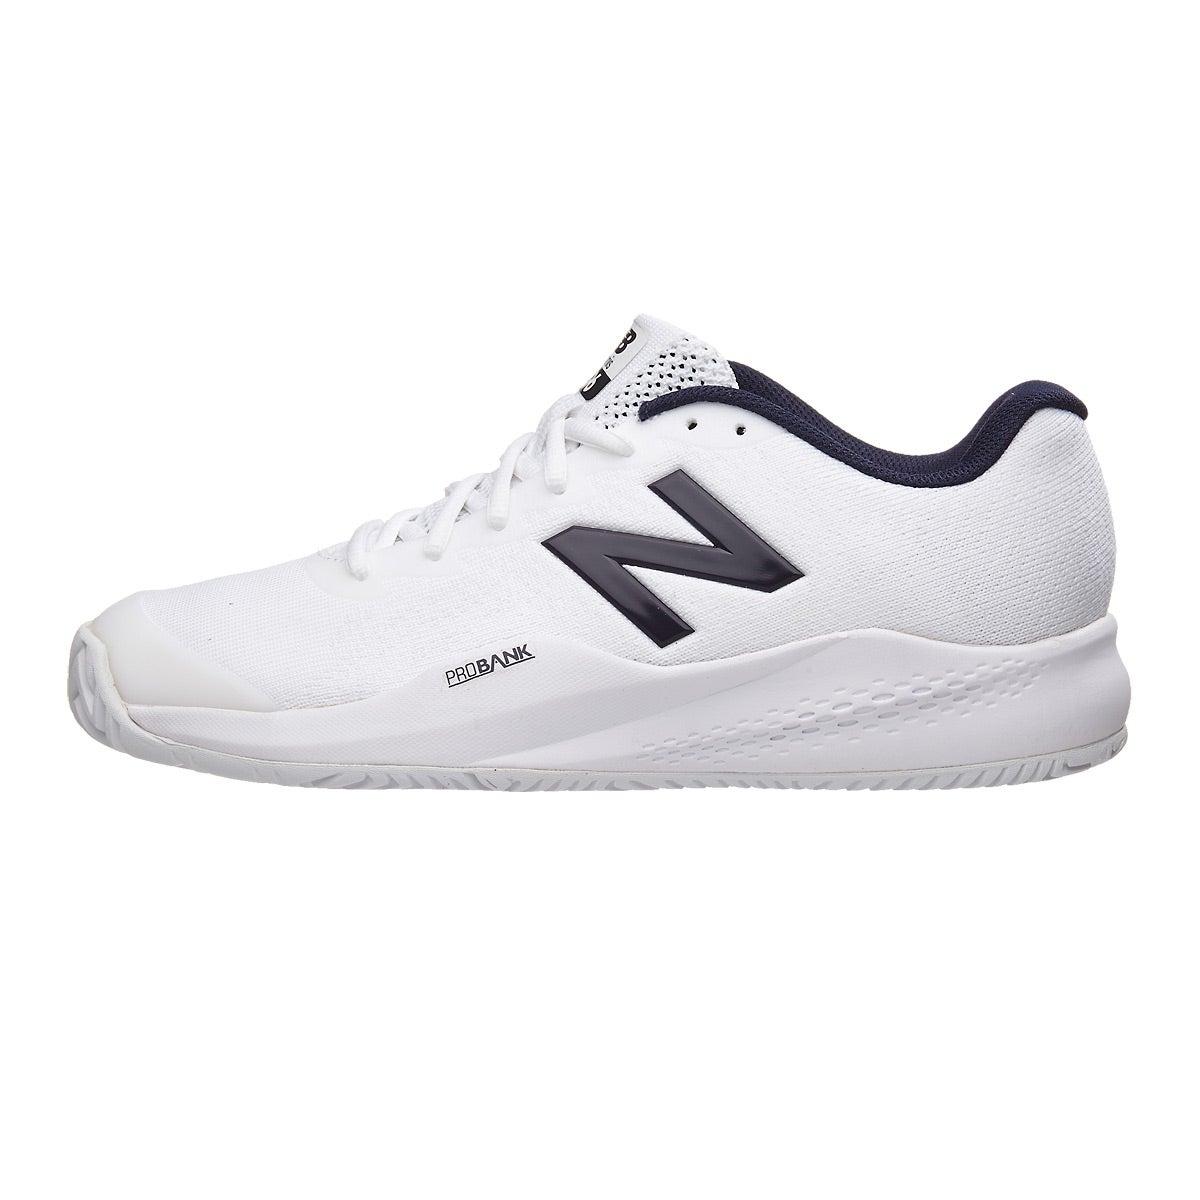 Newbalance Shoe Men